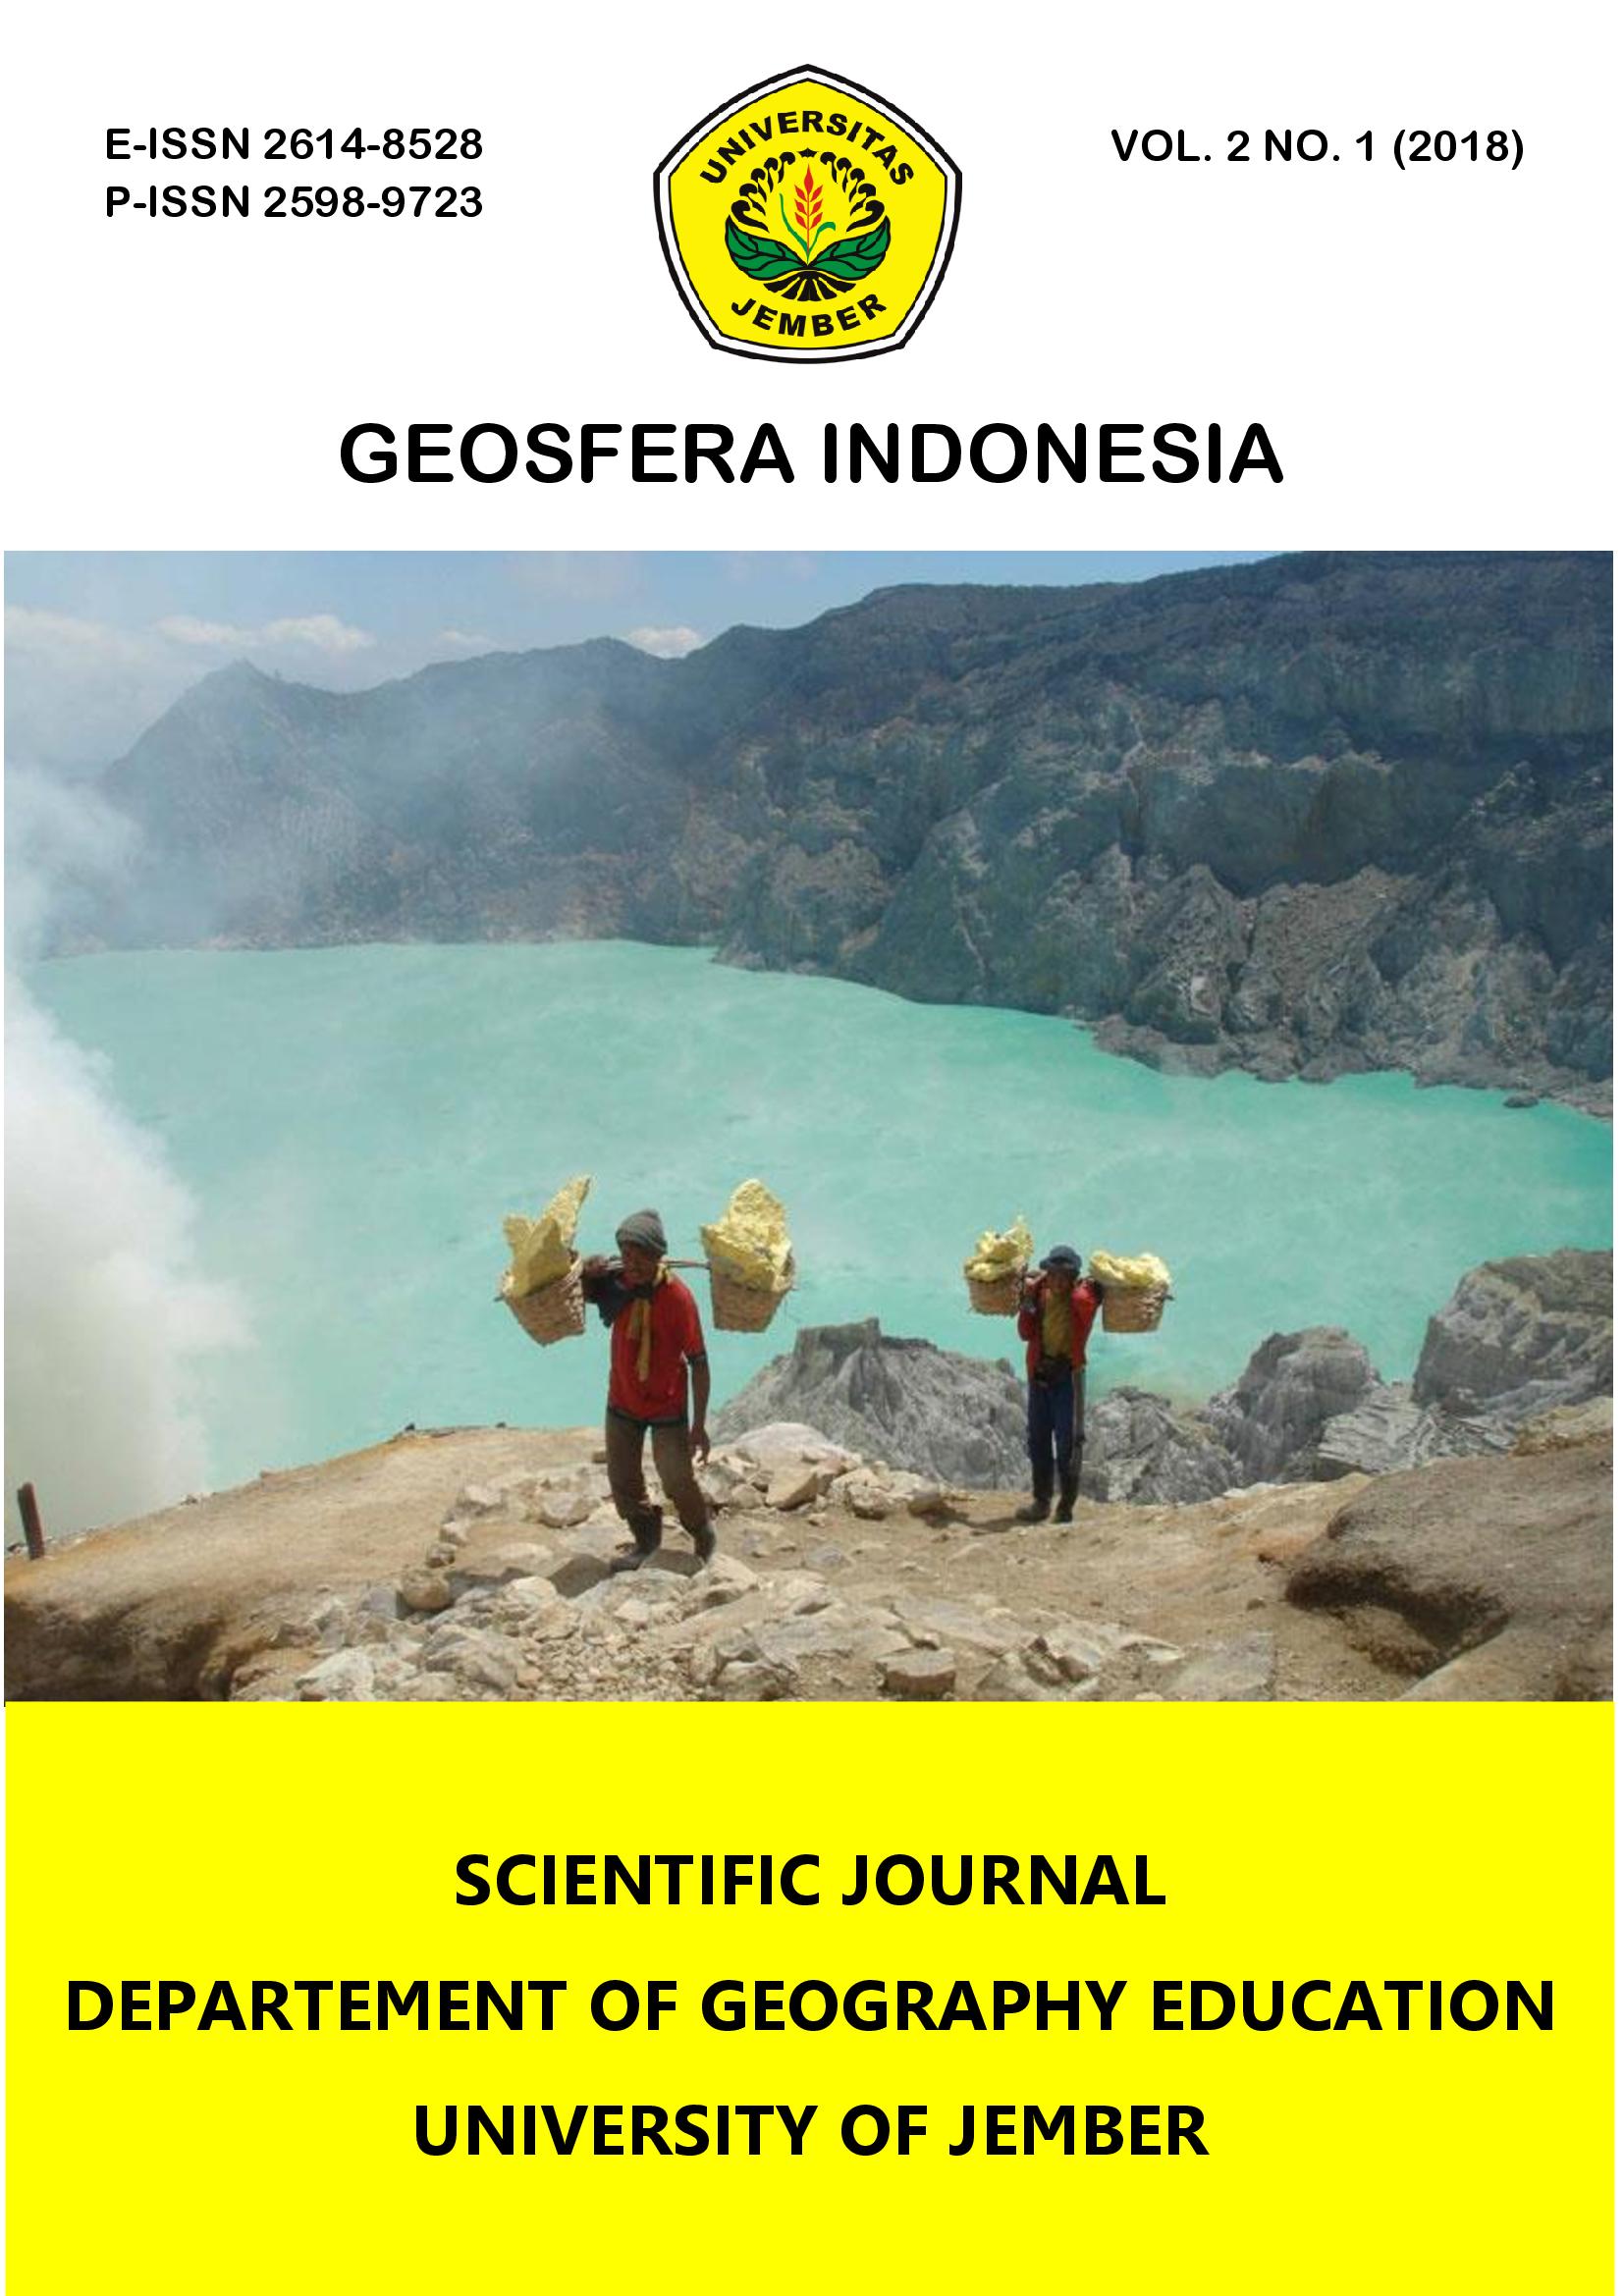 Vol 2 No 1 (2018): GEOSFERA INDONESIA